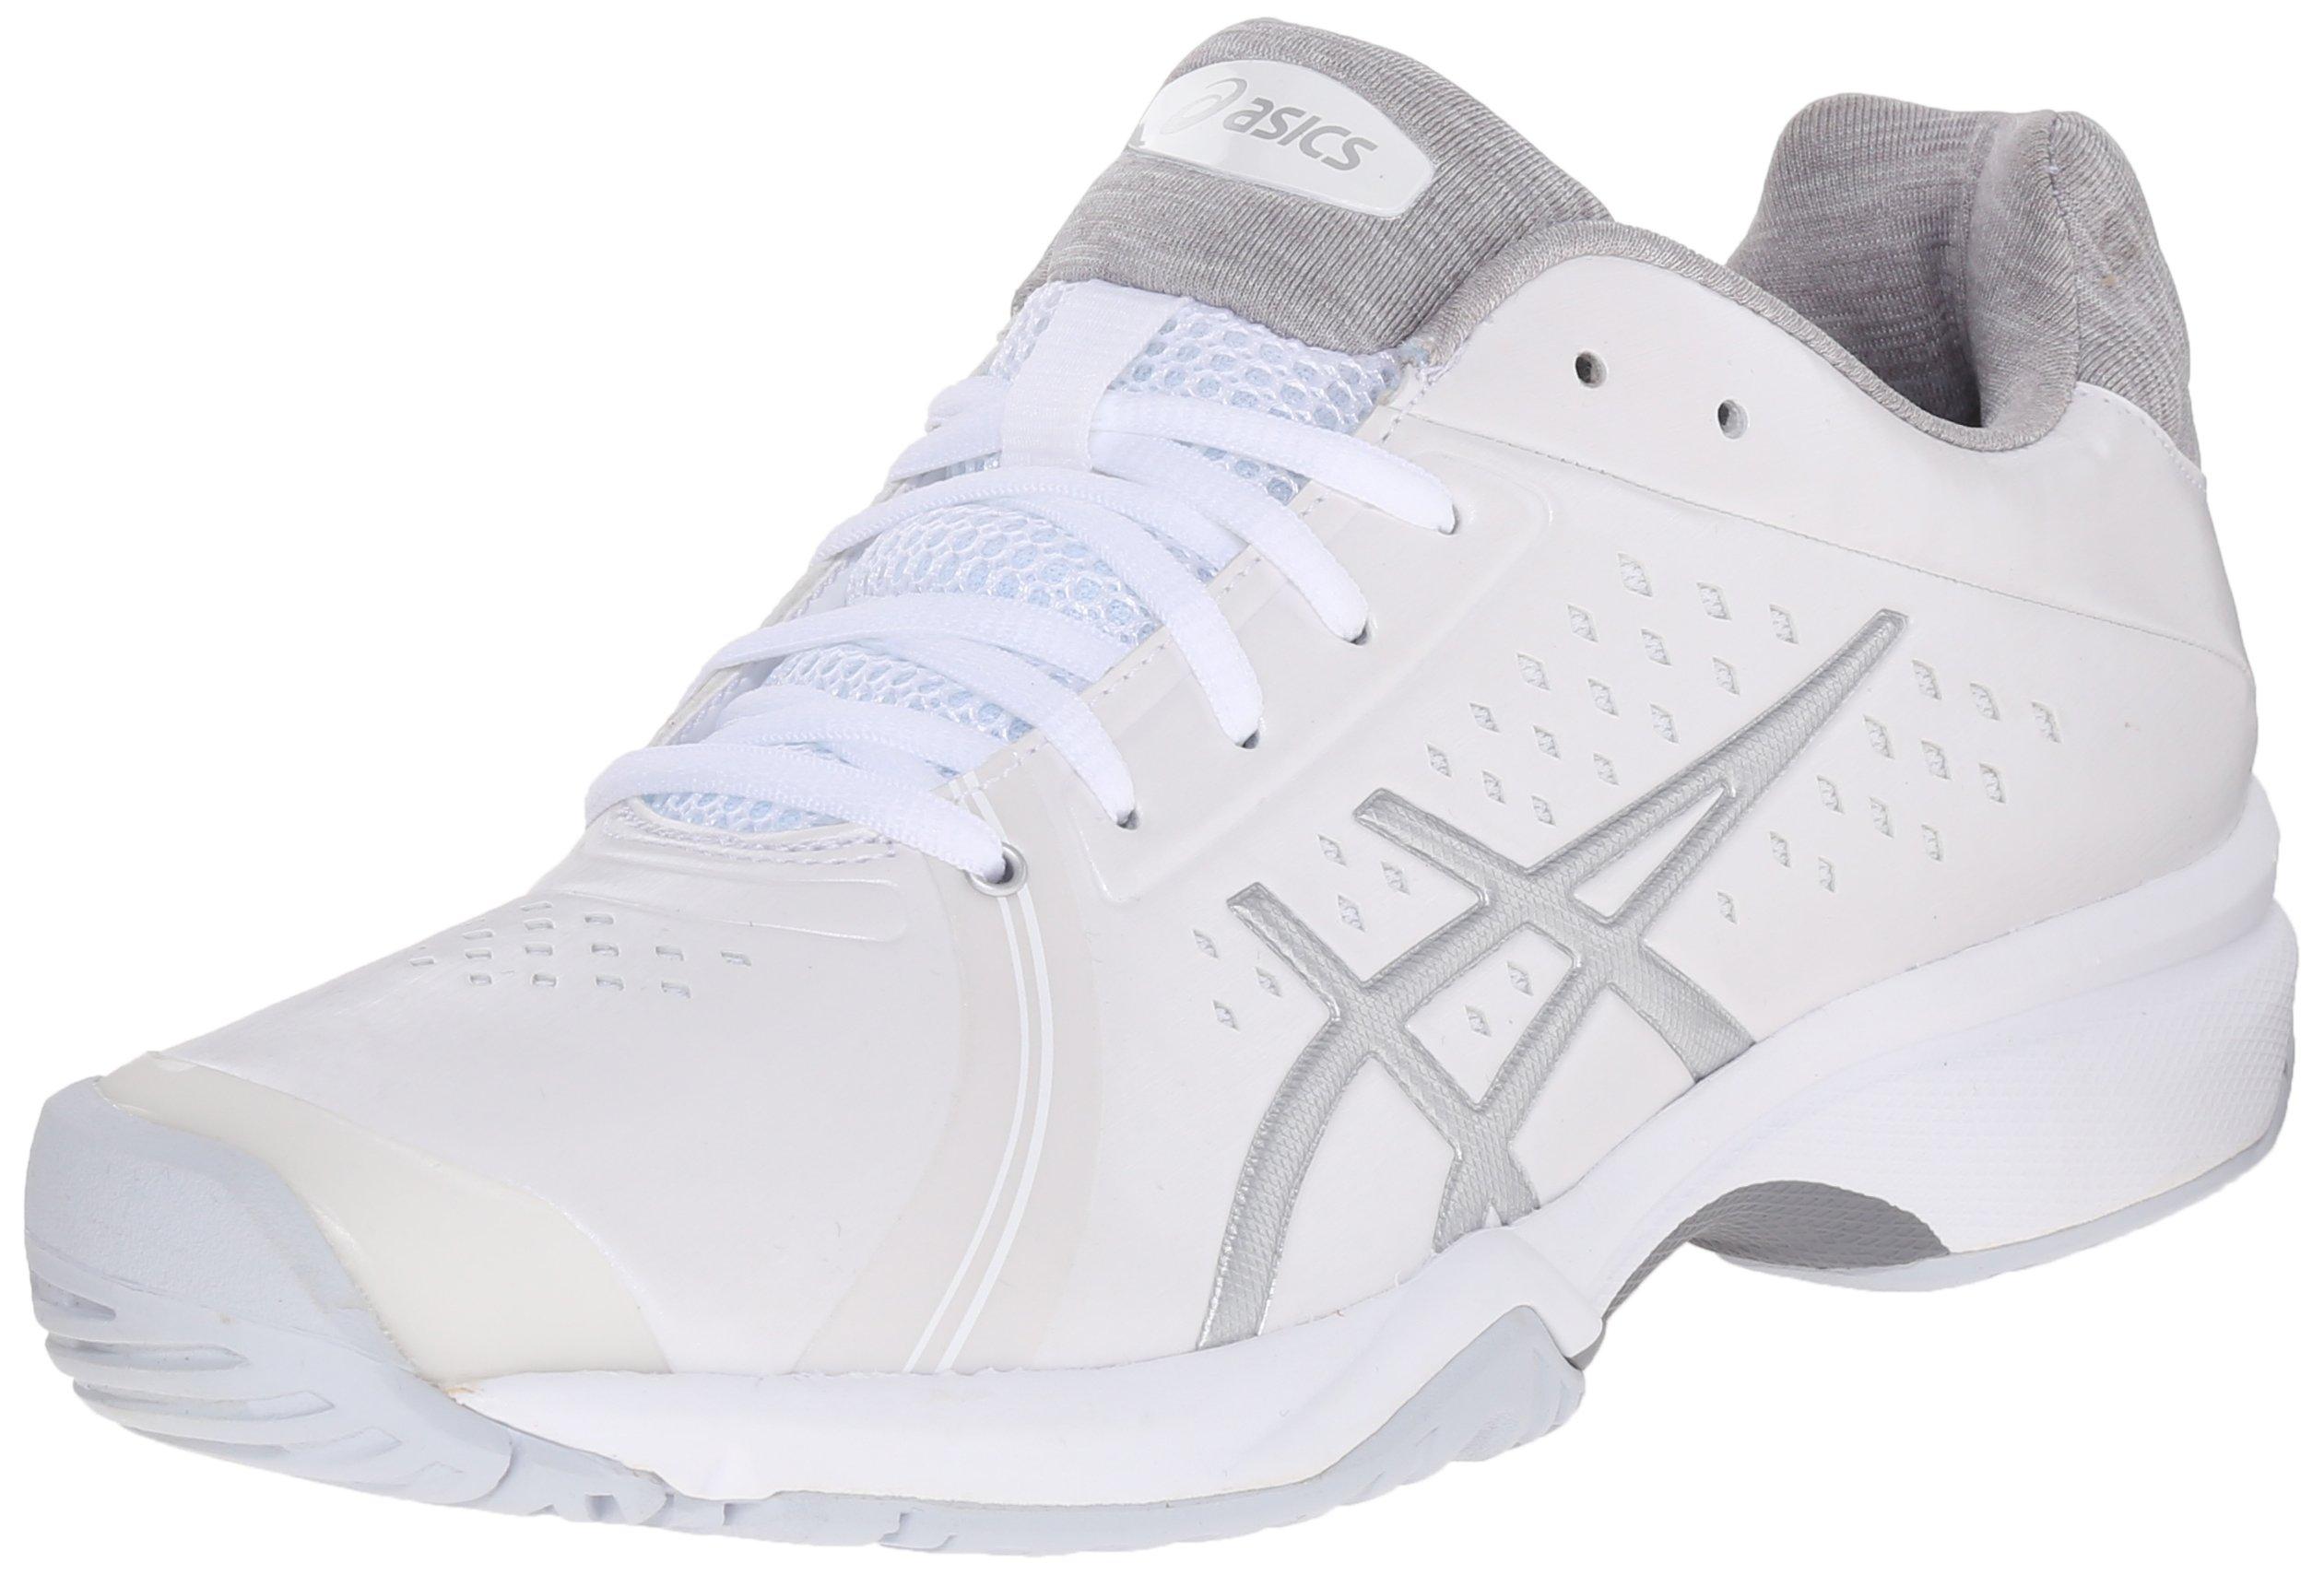 e3b0ffd13ab1 Galleon - ASICS Women s GEL-Court Bella Tennis Shoe